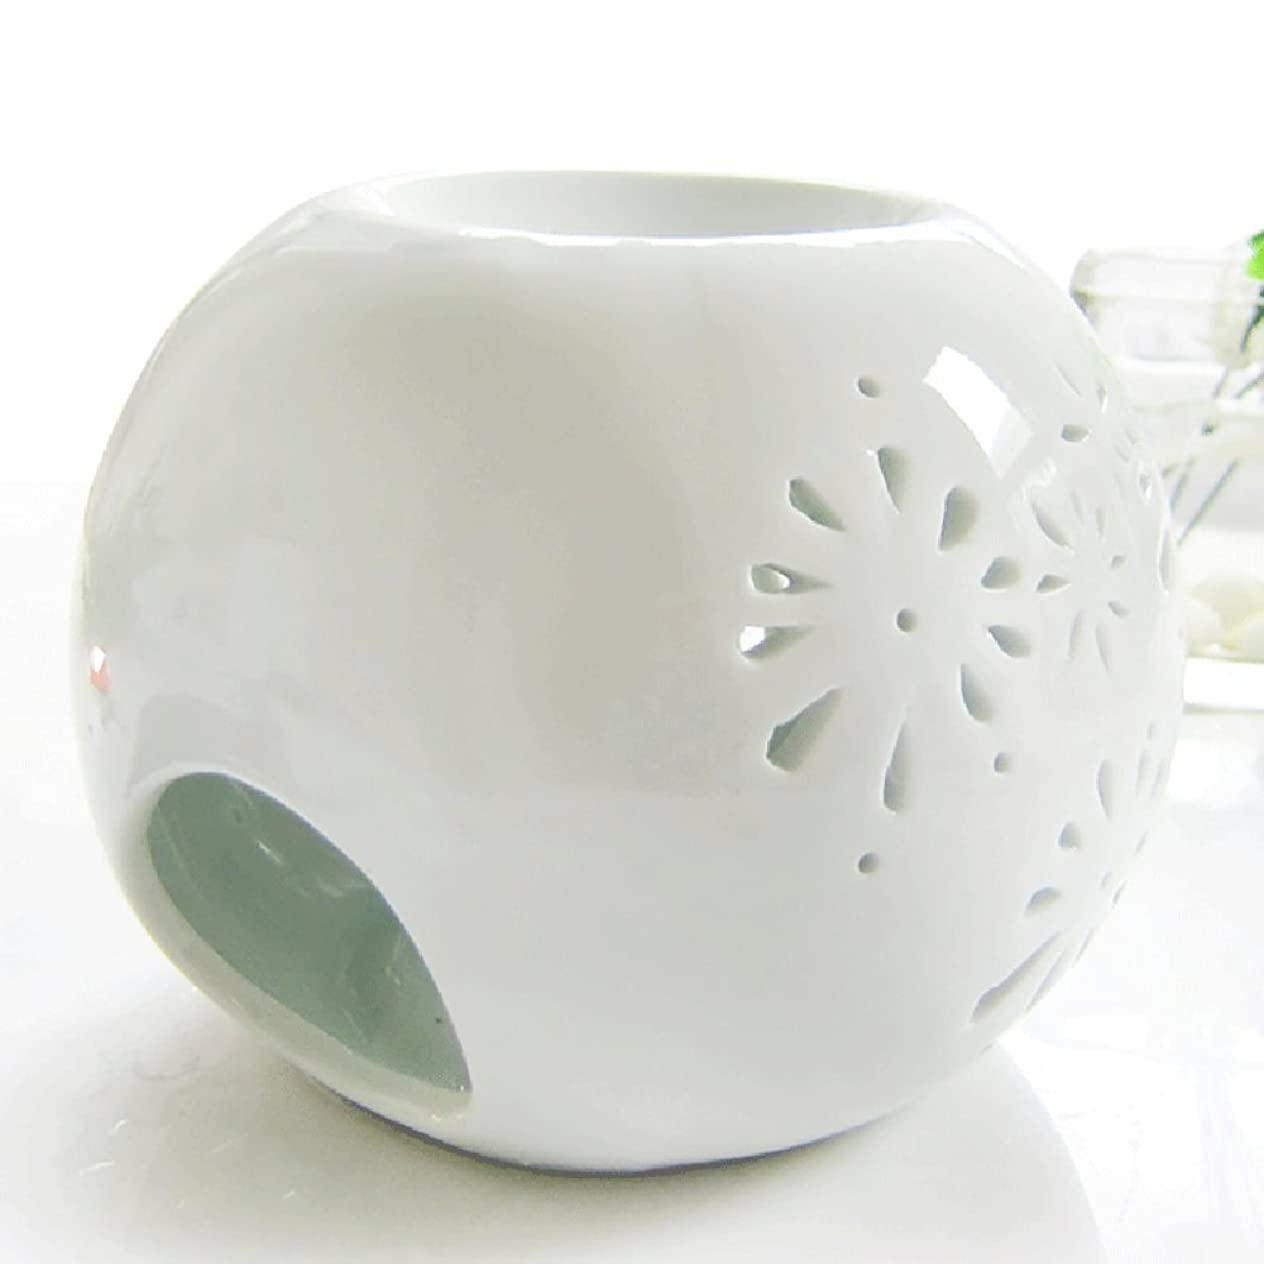 DEBON Creative Milk White Ceramic Hollowing Floral Aroma Lamp Oil Diffuser Essential Oil Lamp Aromatherapy Furnace Ceramic Incense Burner Oil Candle Furnace Tea Light Holder Candle Holders (C) tlqhbmyp087